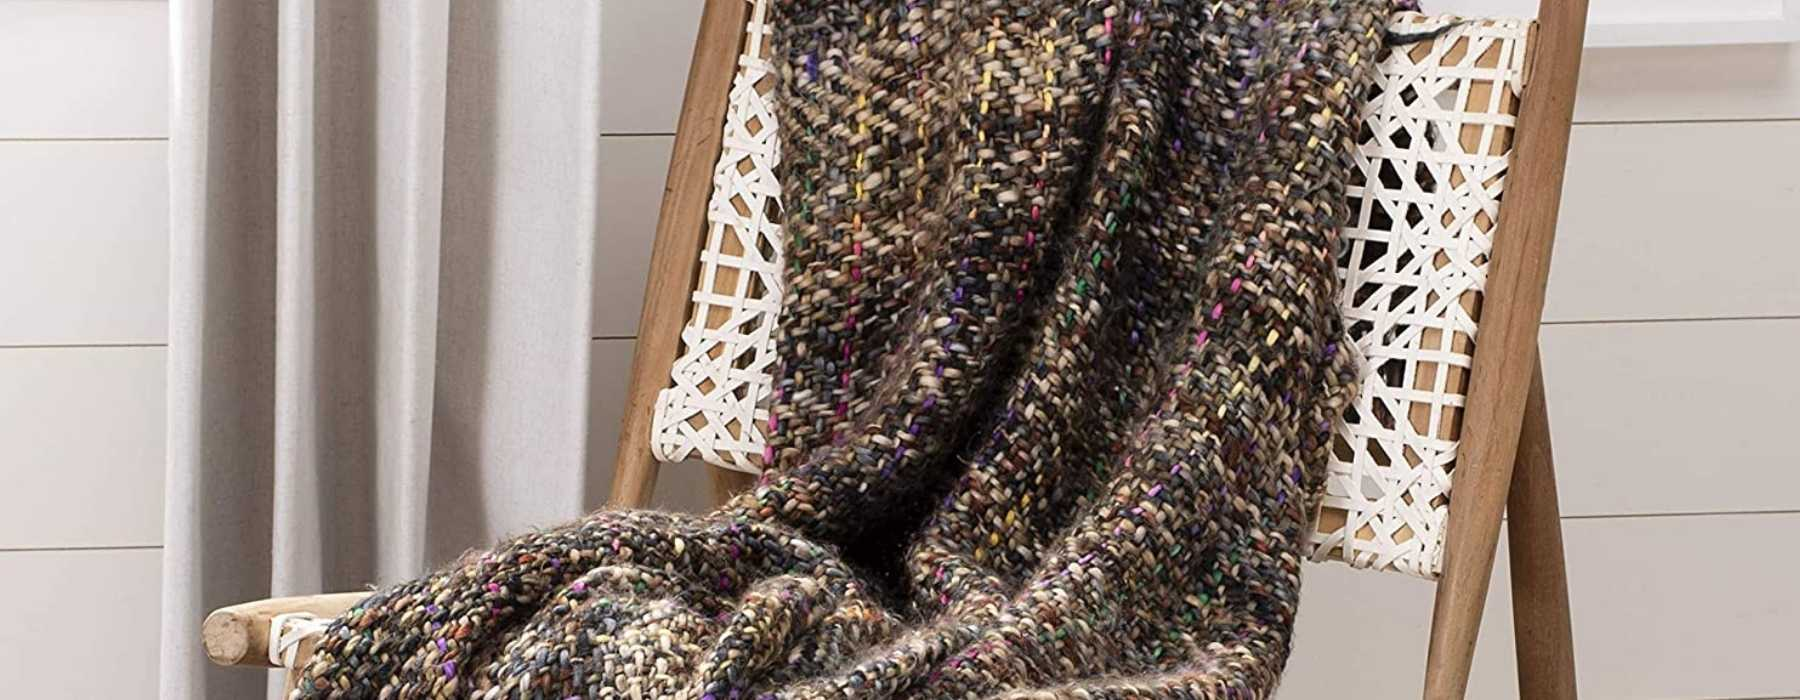 Outdoor Fall Wedding Essentials - cozy blankets